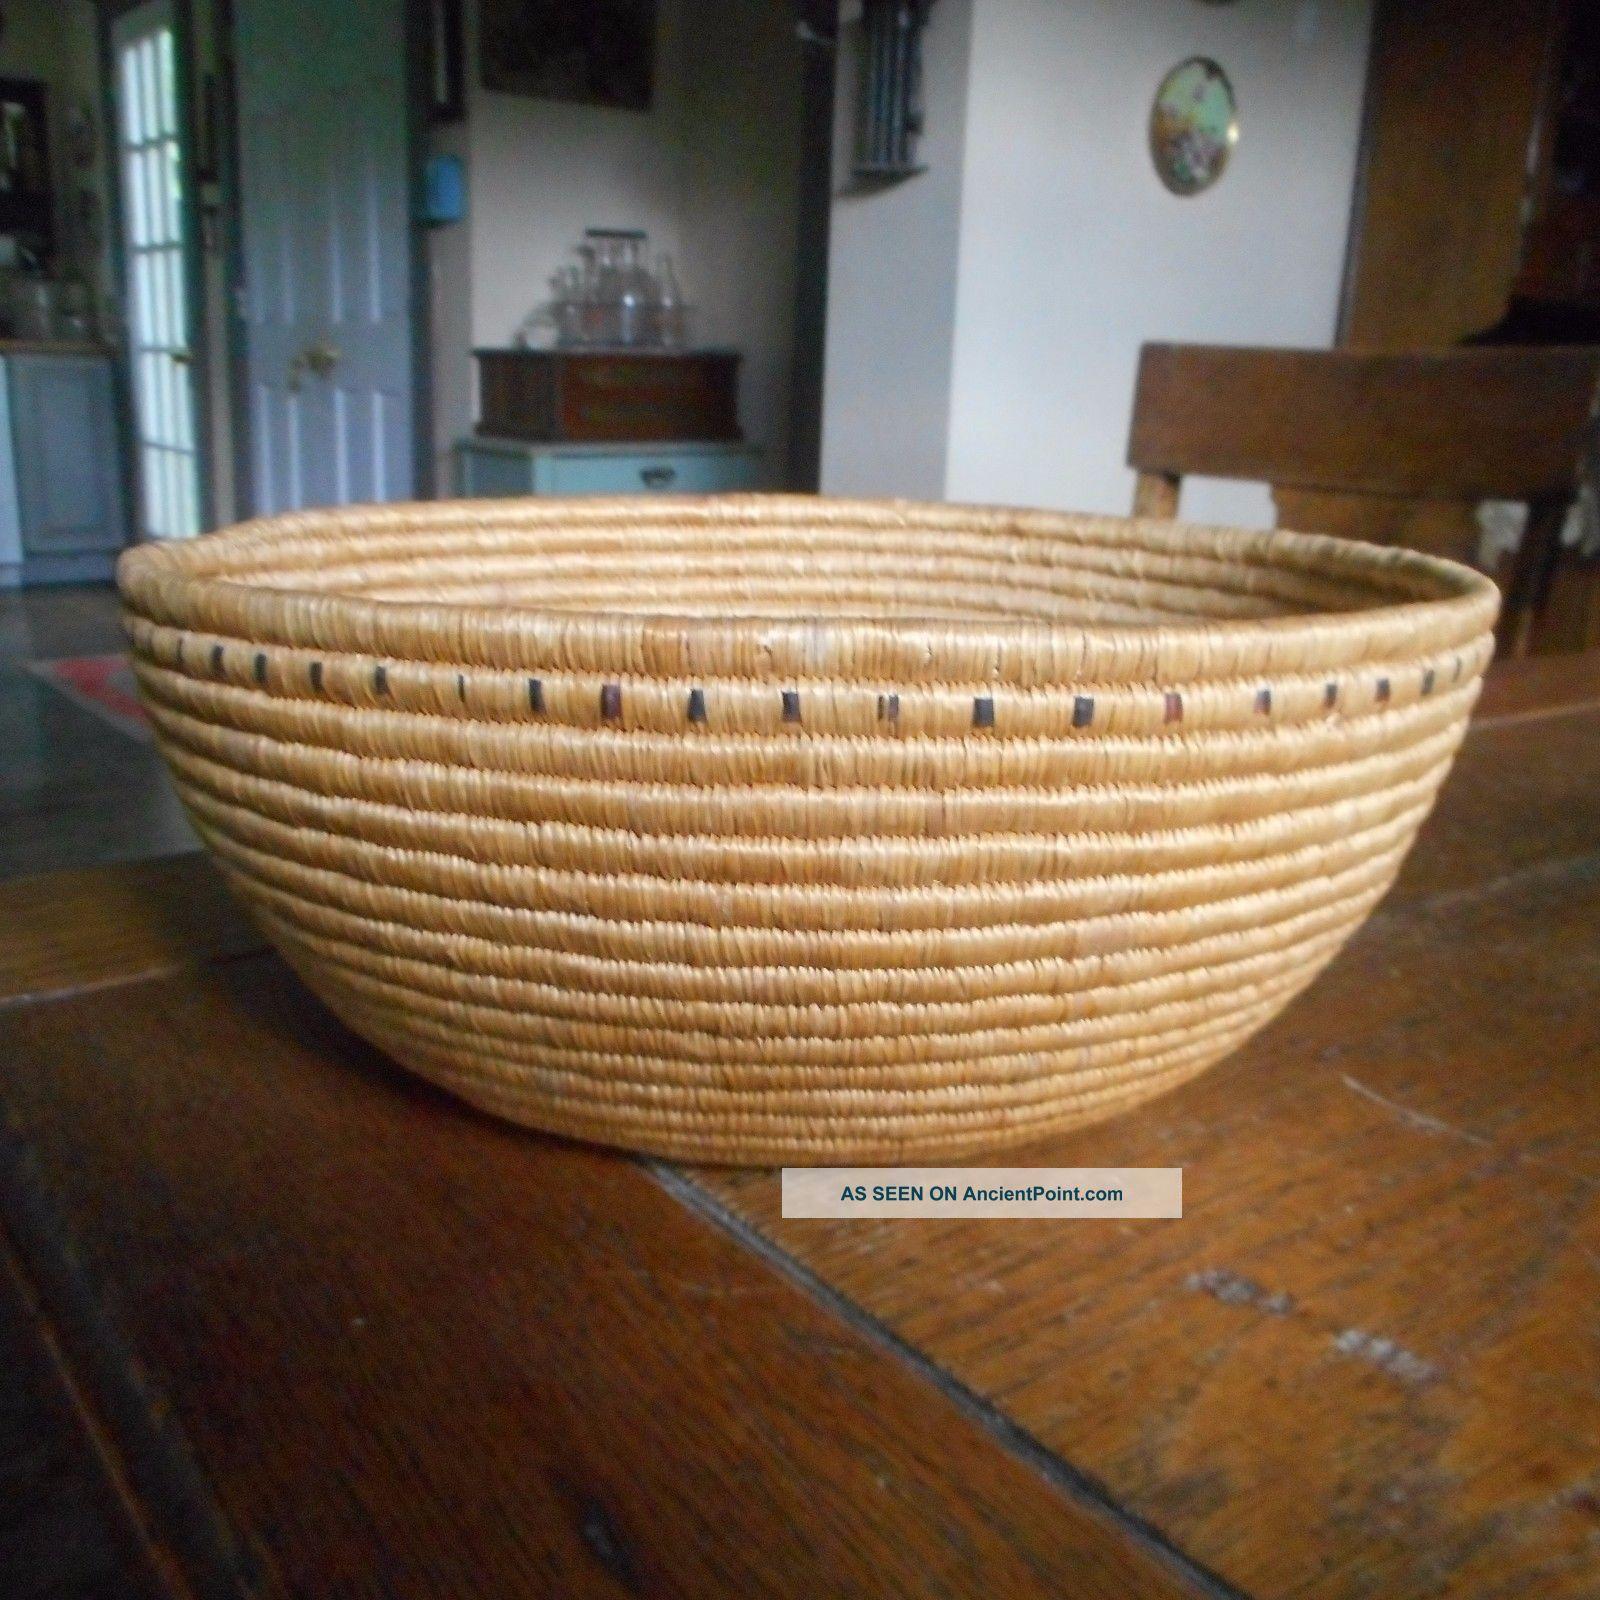 Vintage Native American Alaskan Eskimo Woven Coiled Basket 91/2